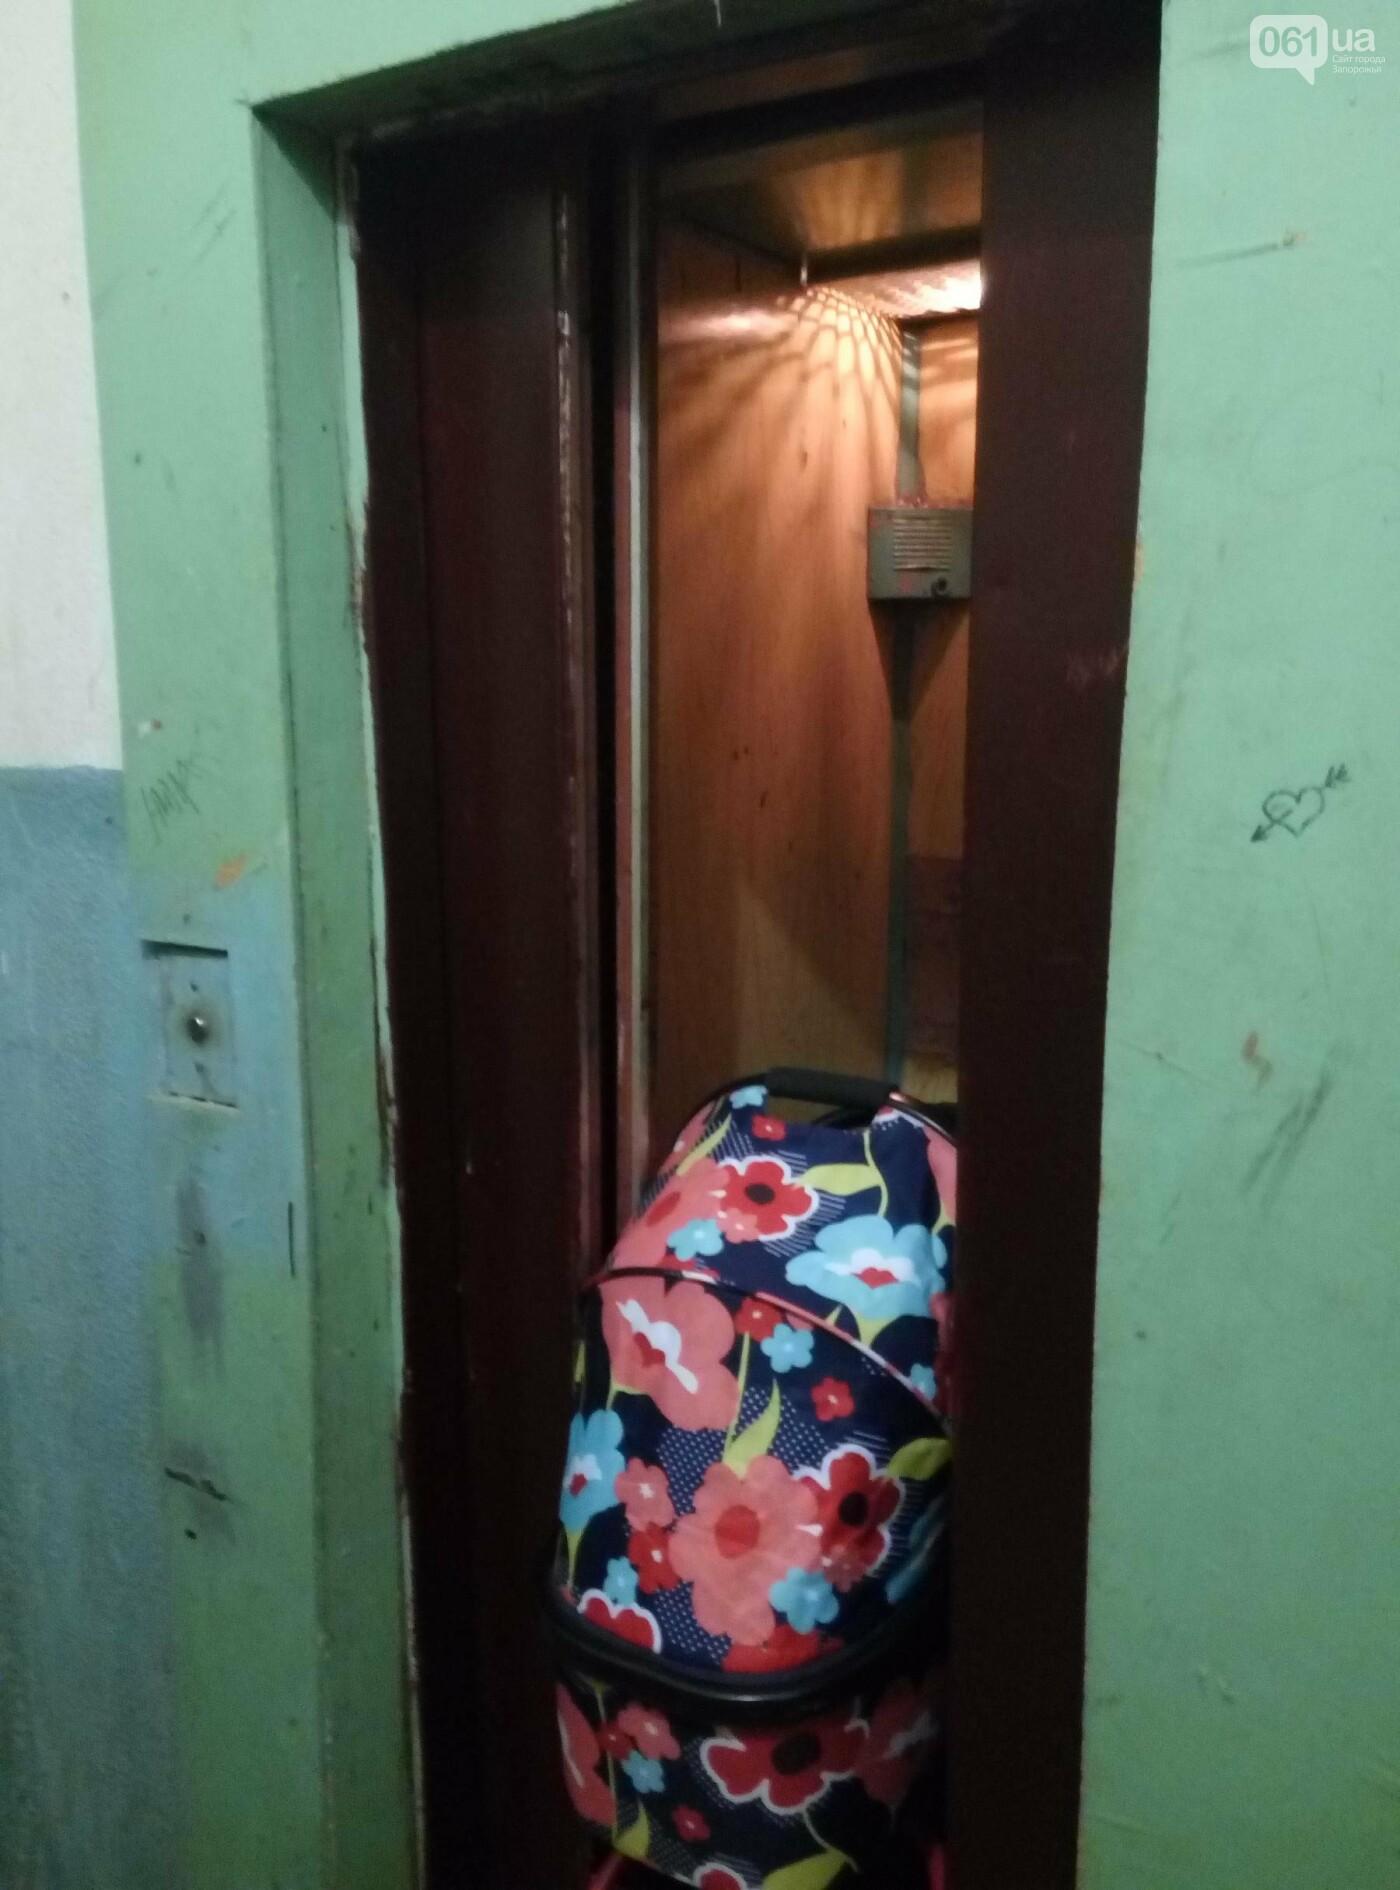 В Запорожье дверьми неисправного лифта зажало коляску с ребенком, - ФОТО , фото-1